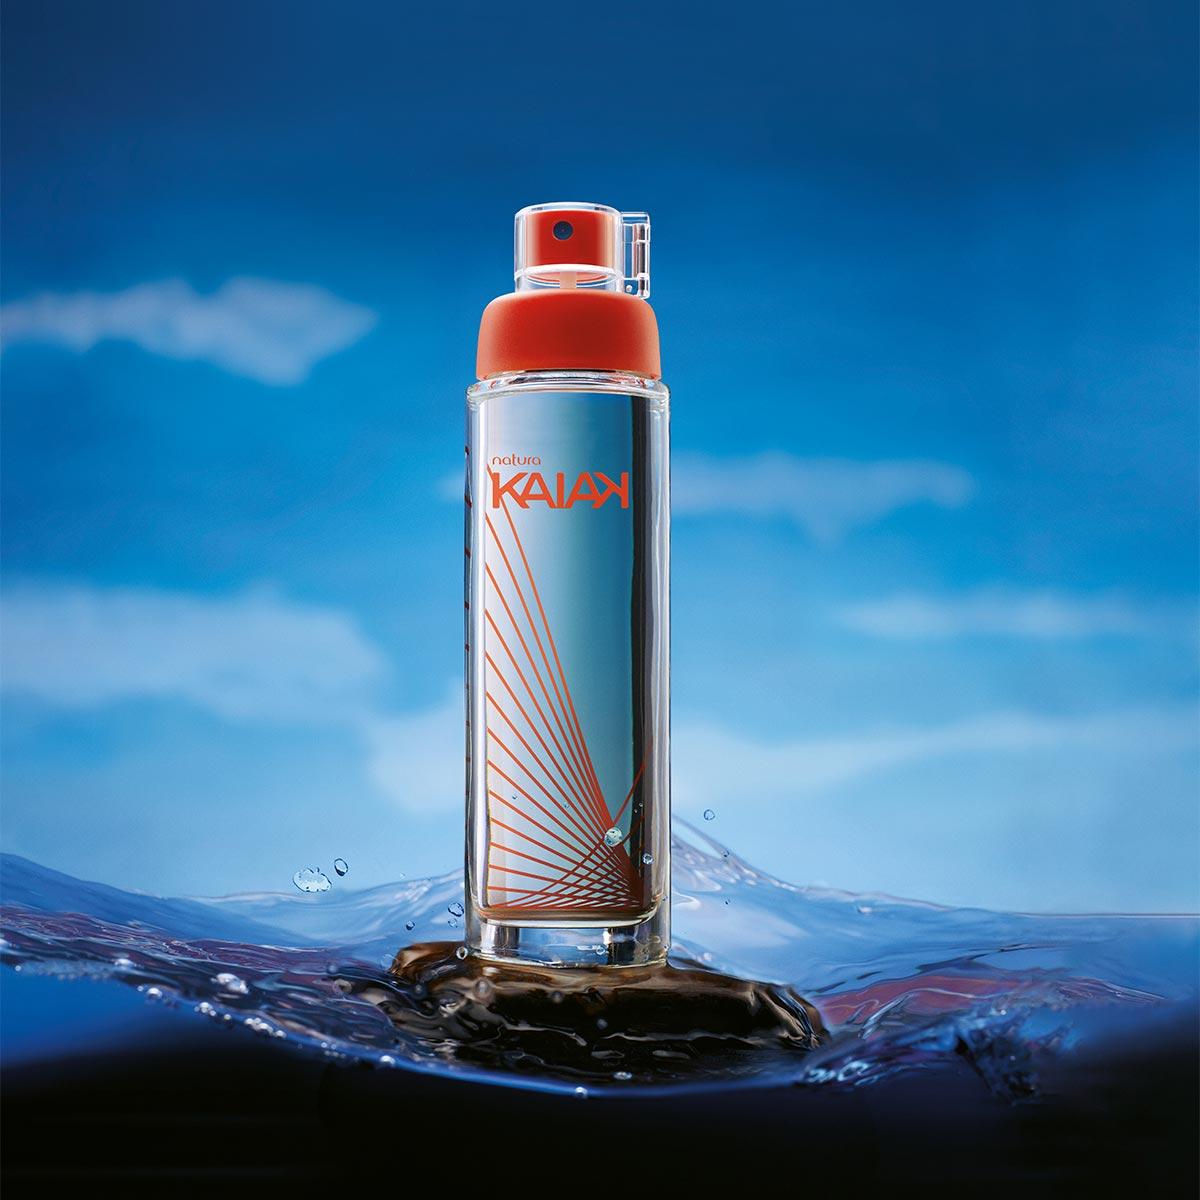 Desodorante Colônia Kaiak Feminino - 100ml - 13120